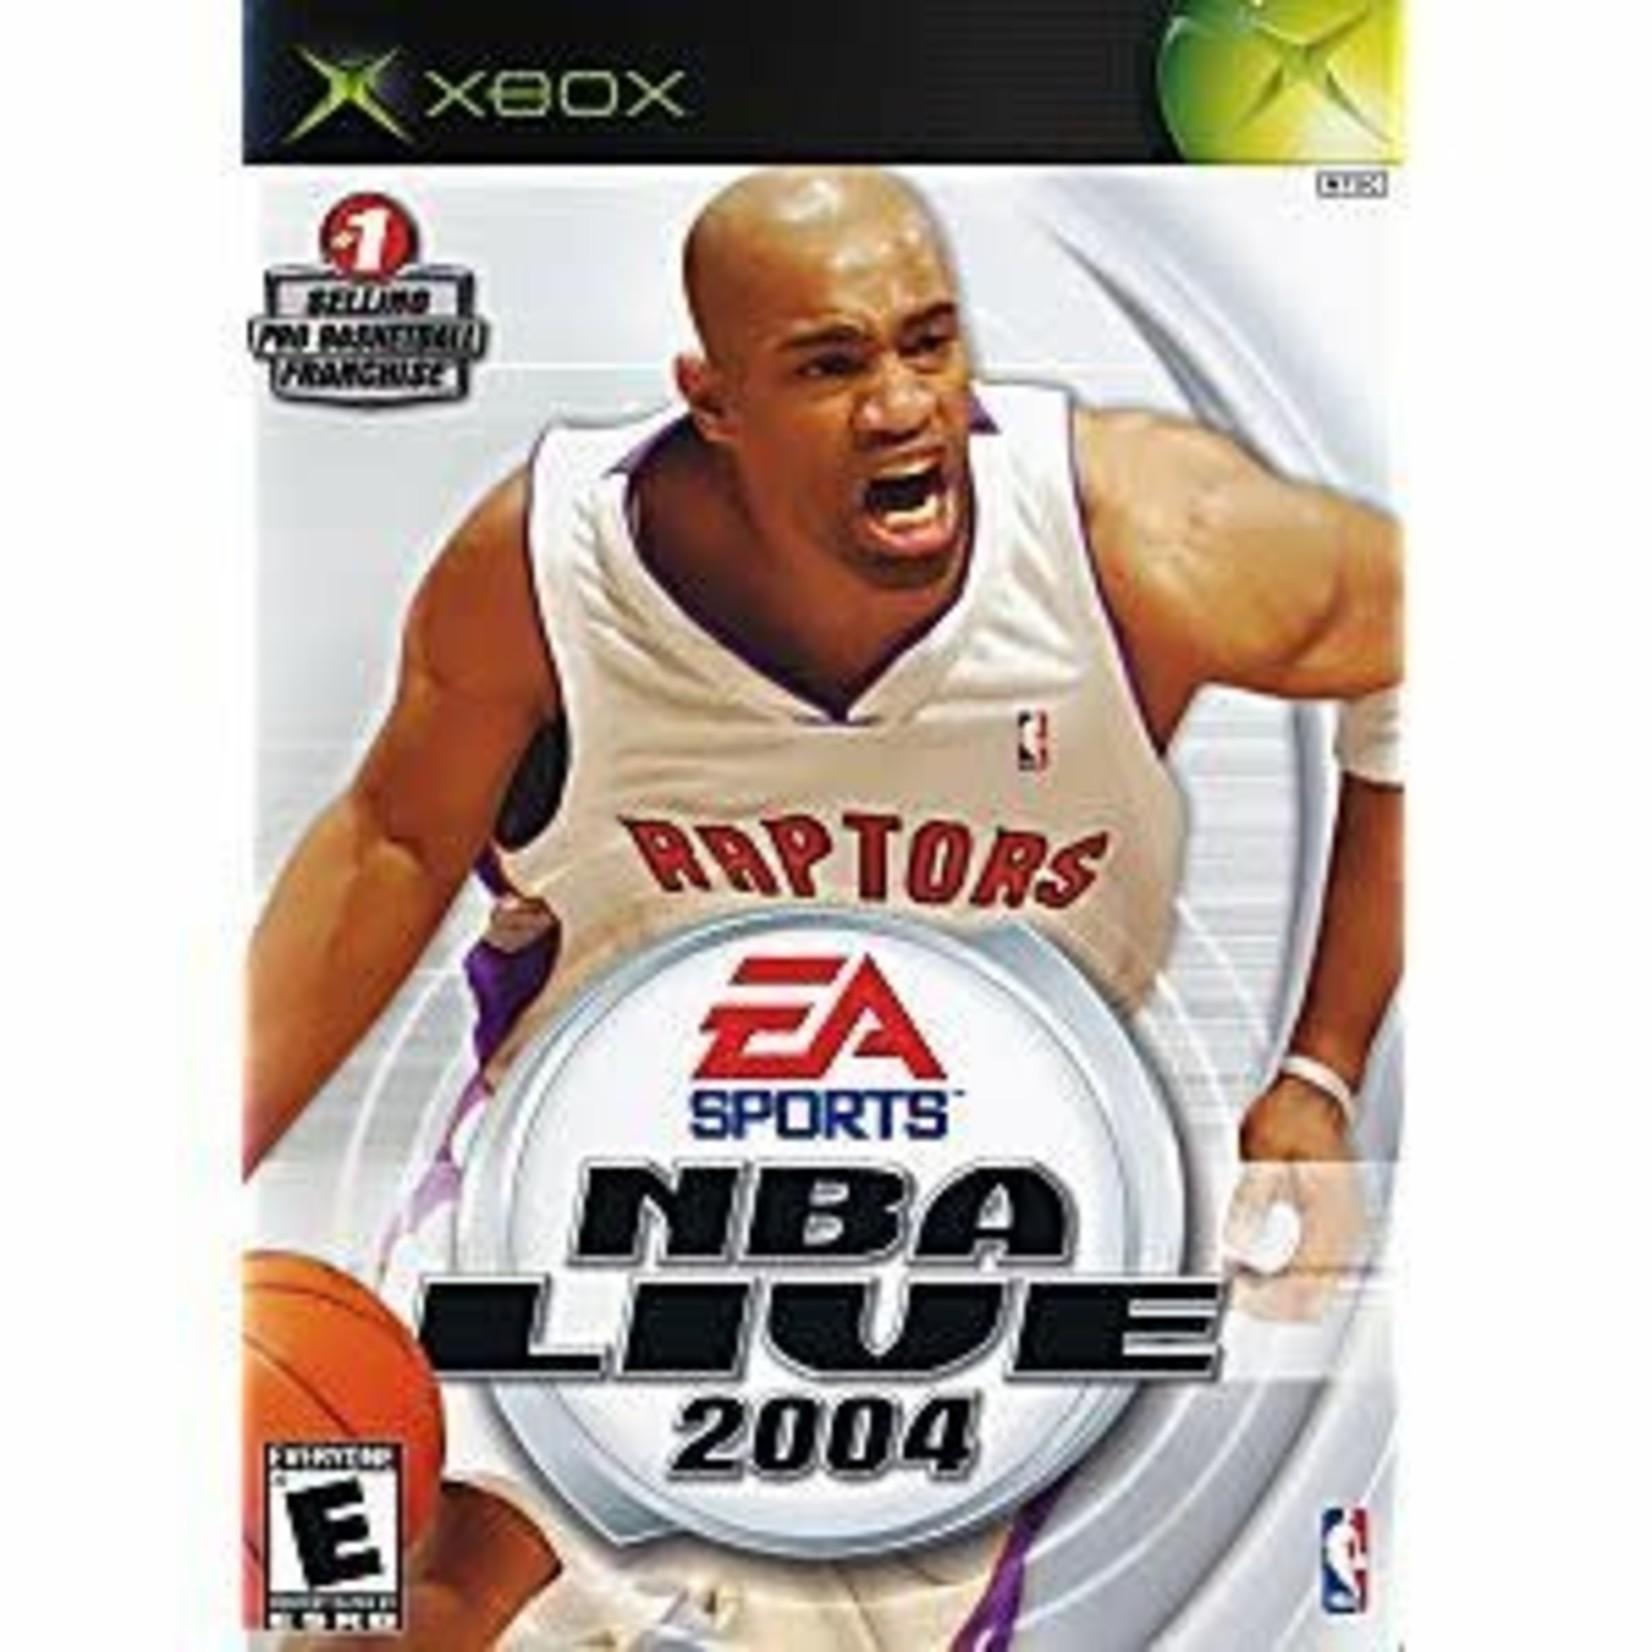 XBU-NBA Live 2004